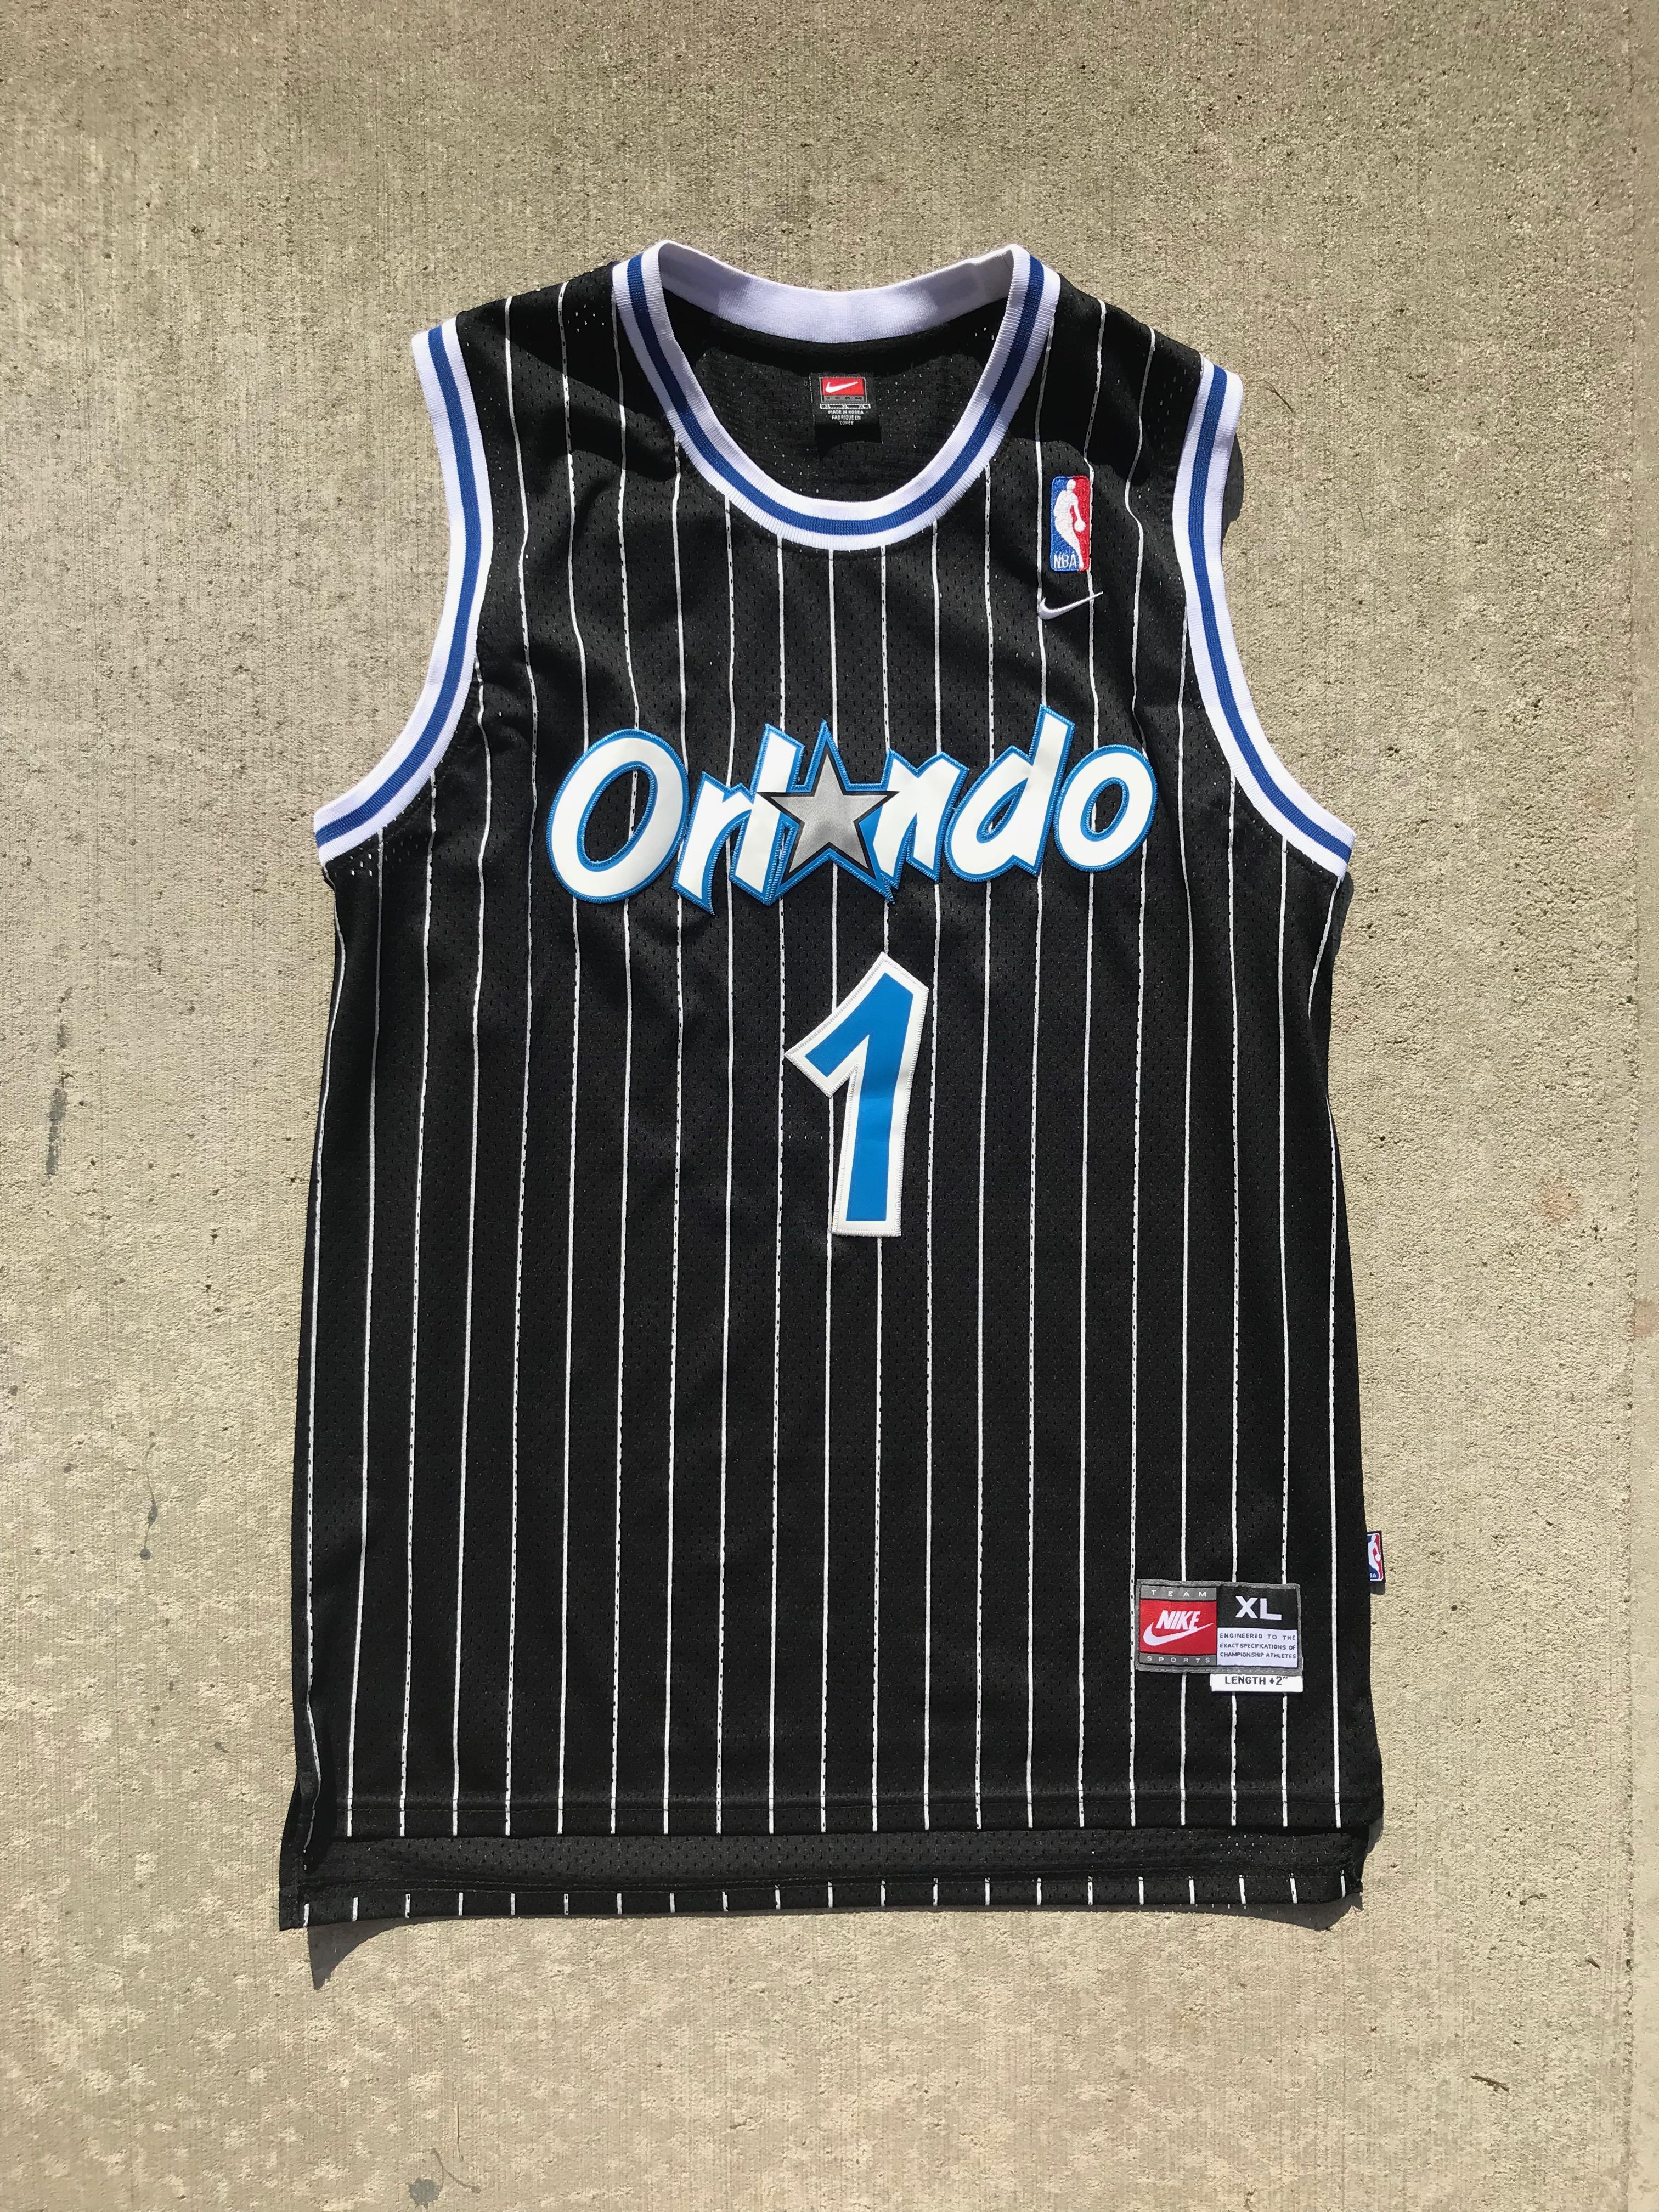 super popular 69ba9 2e2c6 Nike Vintage Orlando Magic Penny Hardaway Jersey